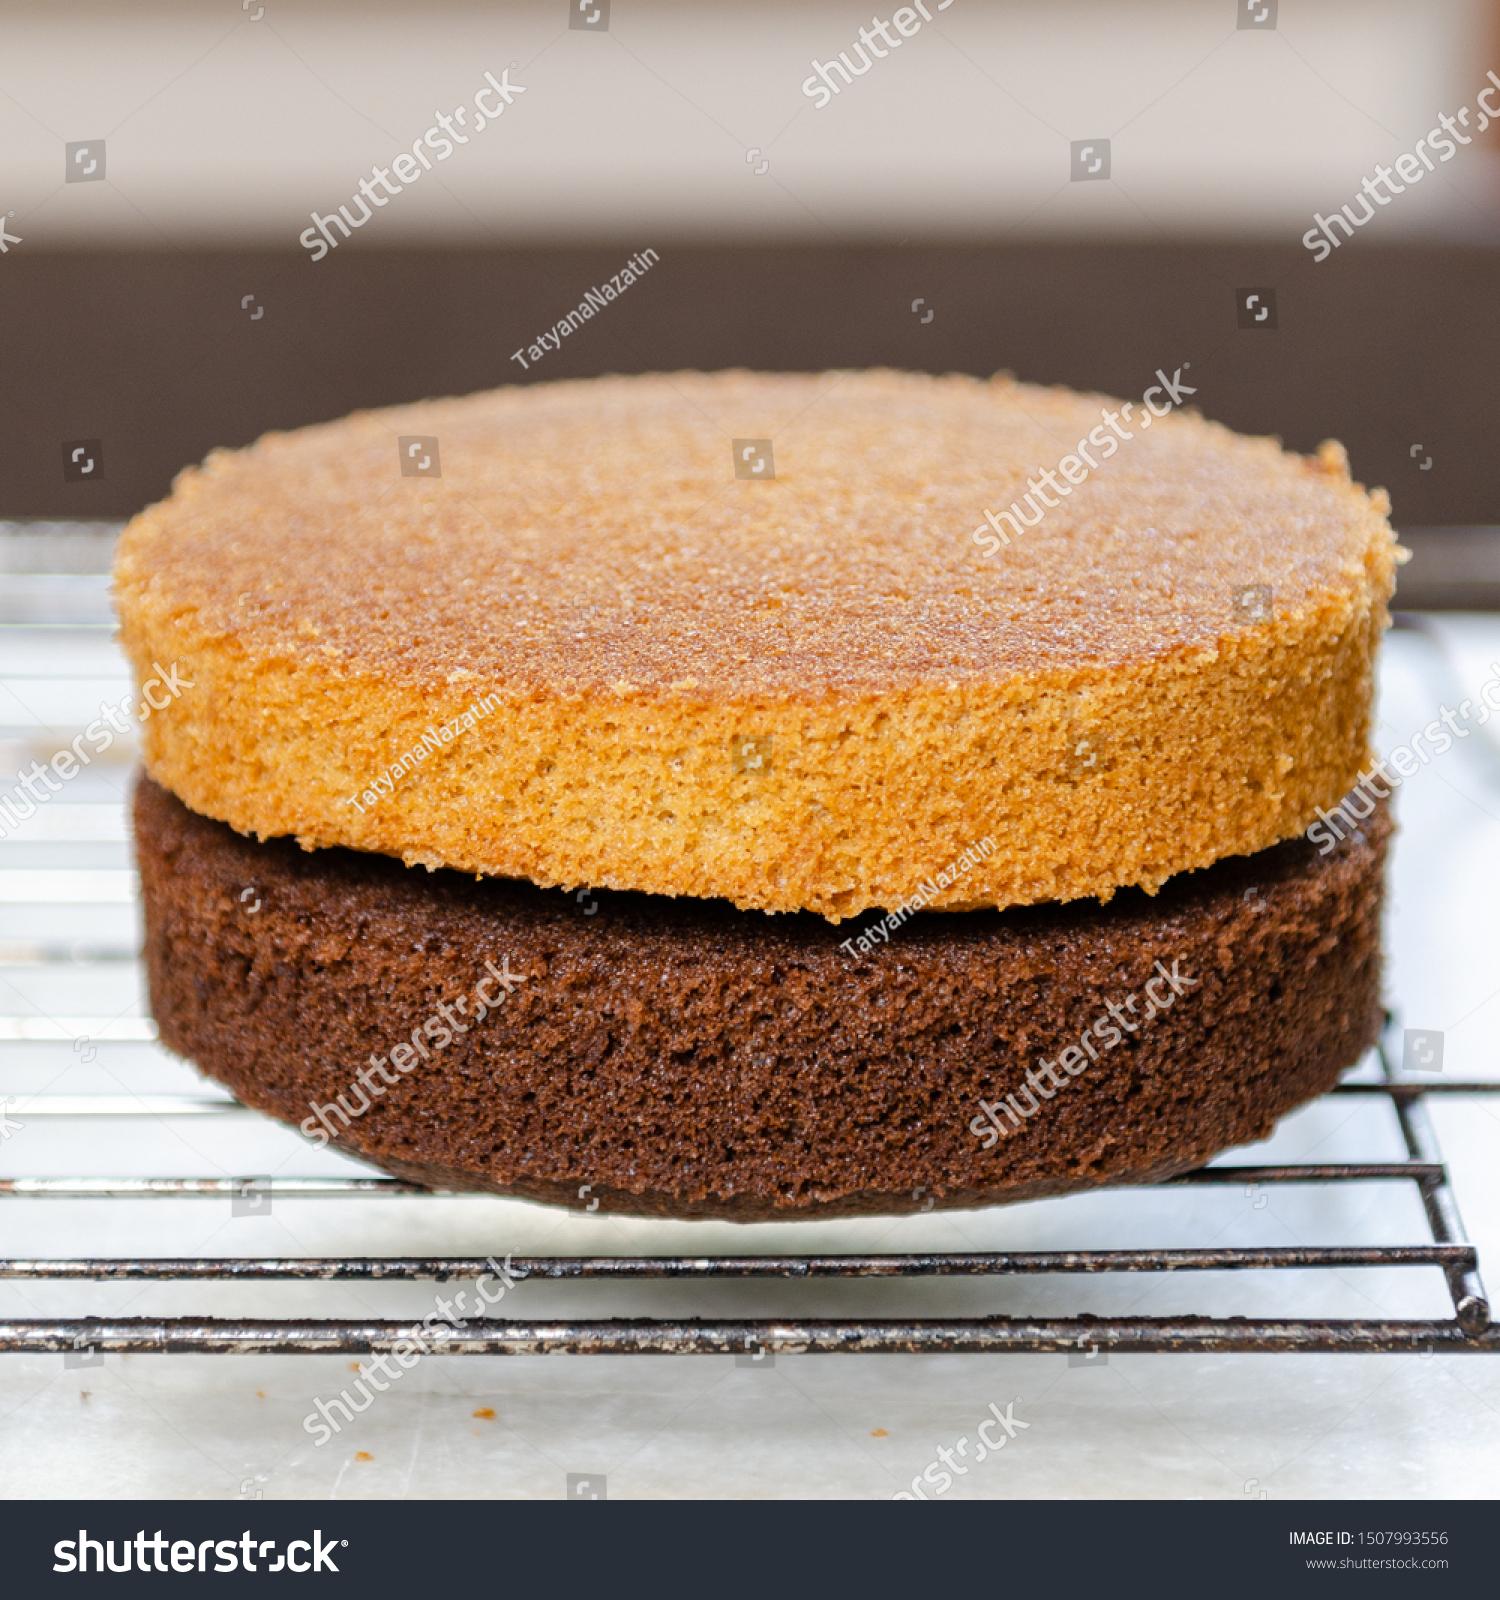 Super Chocolate Vanilla Sponge Cake Birthday Cake Stock Photo Edit Now Personalised Birthday Cards Arneslily Jamesorg